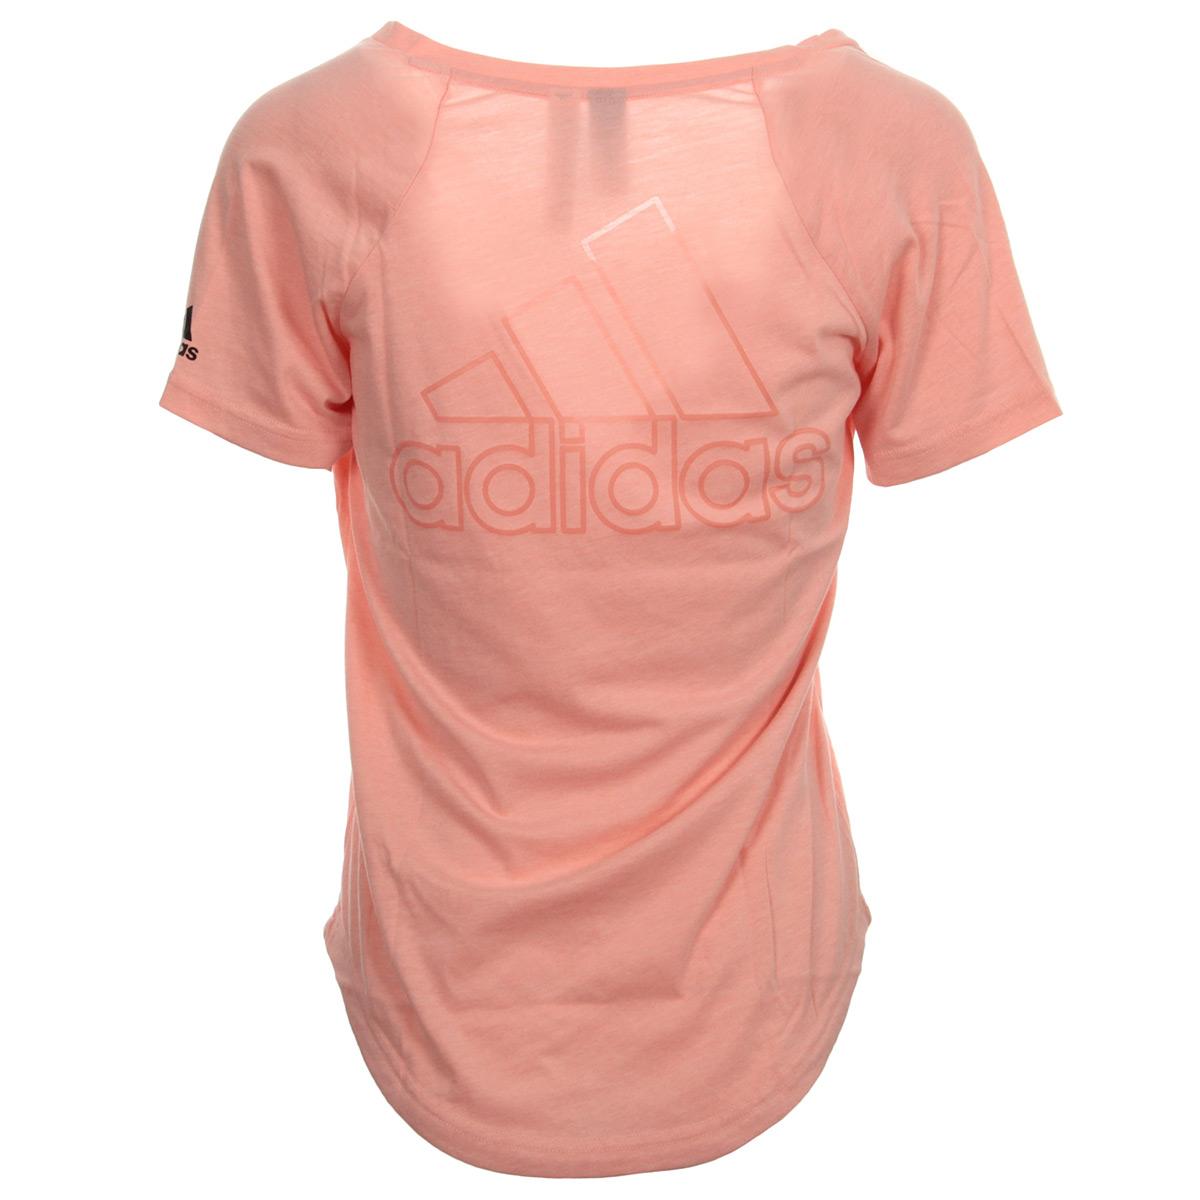 adidas Image Tee S97199, T-Shirts femme